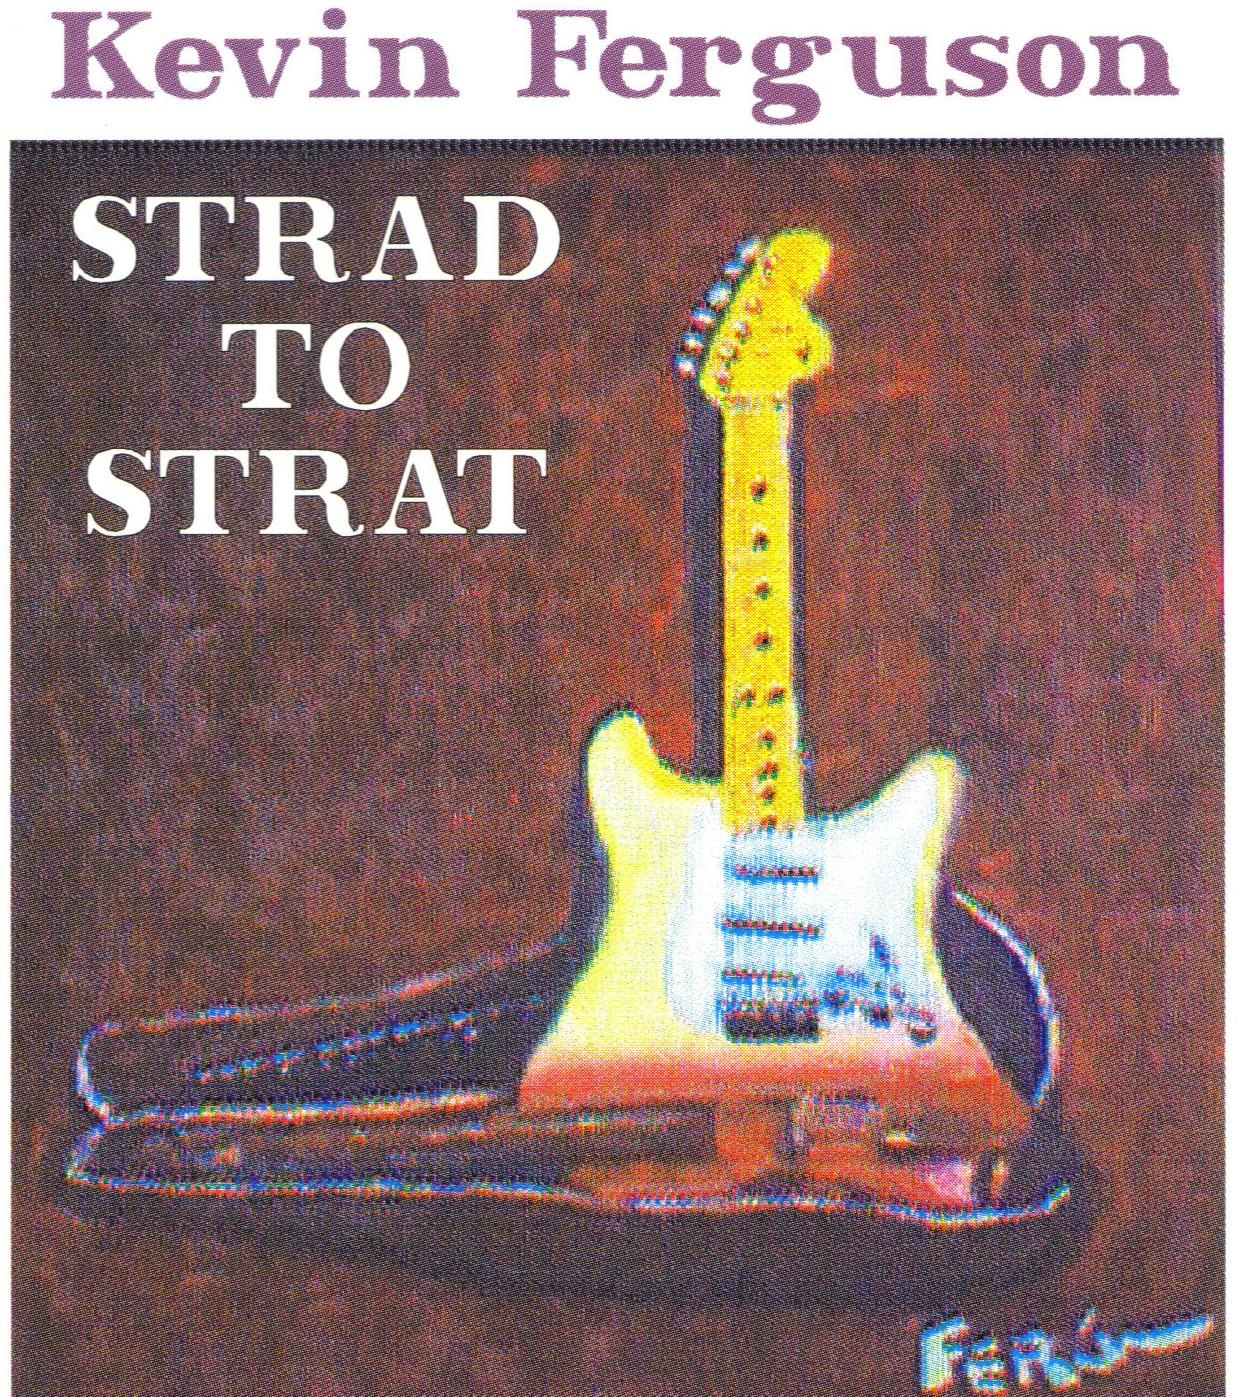 KEVIN FERGUSON / STRAD TO STRAT: ELECTRIC BACH & PAGANINI